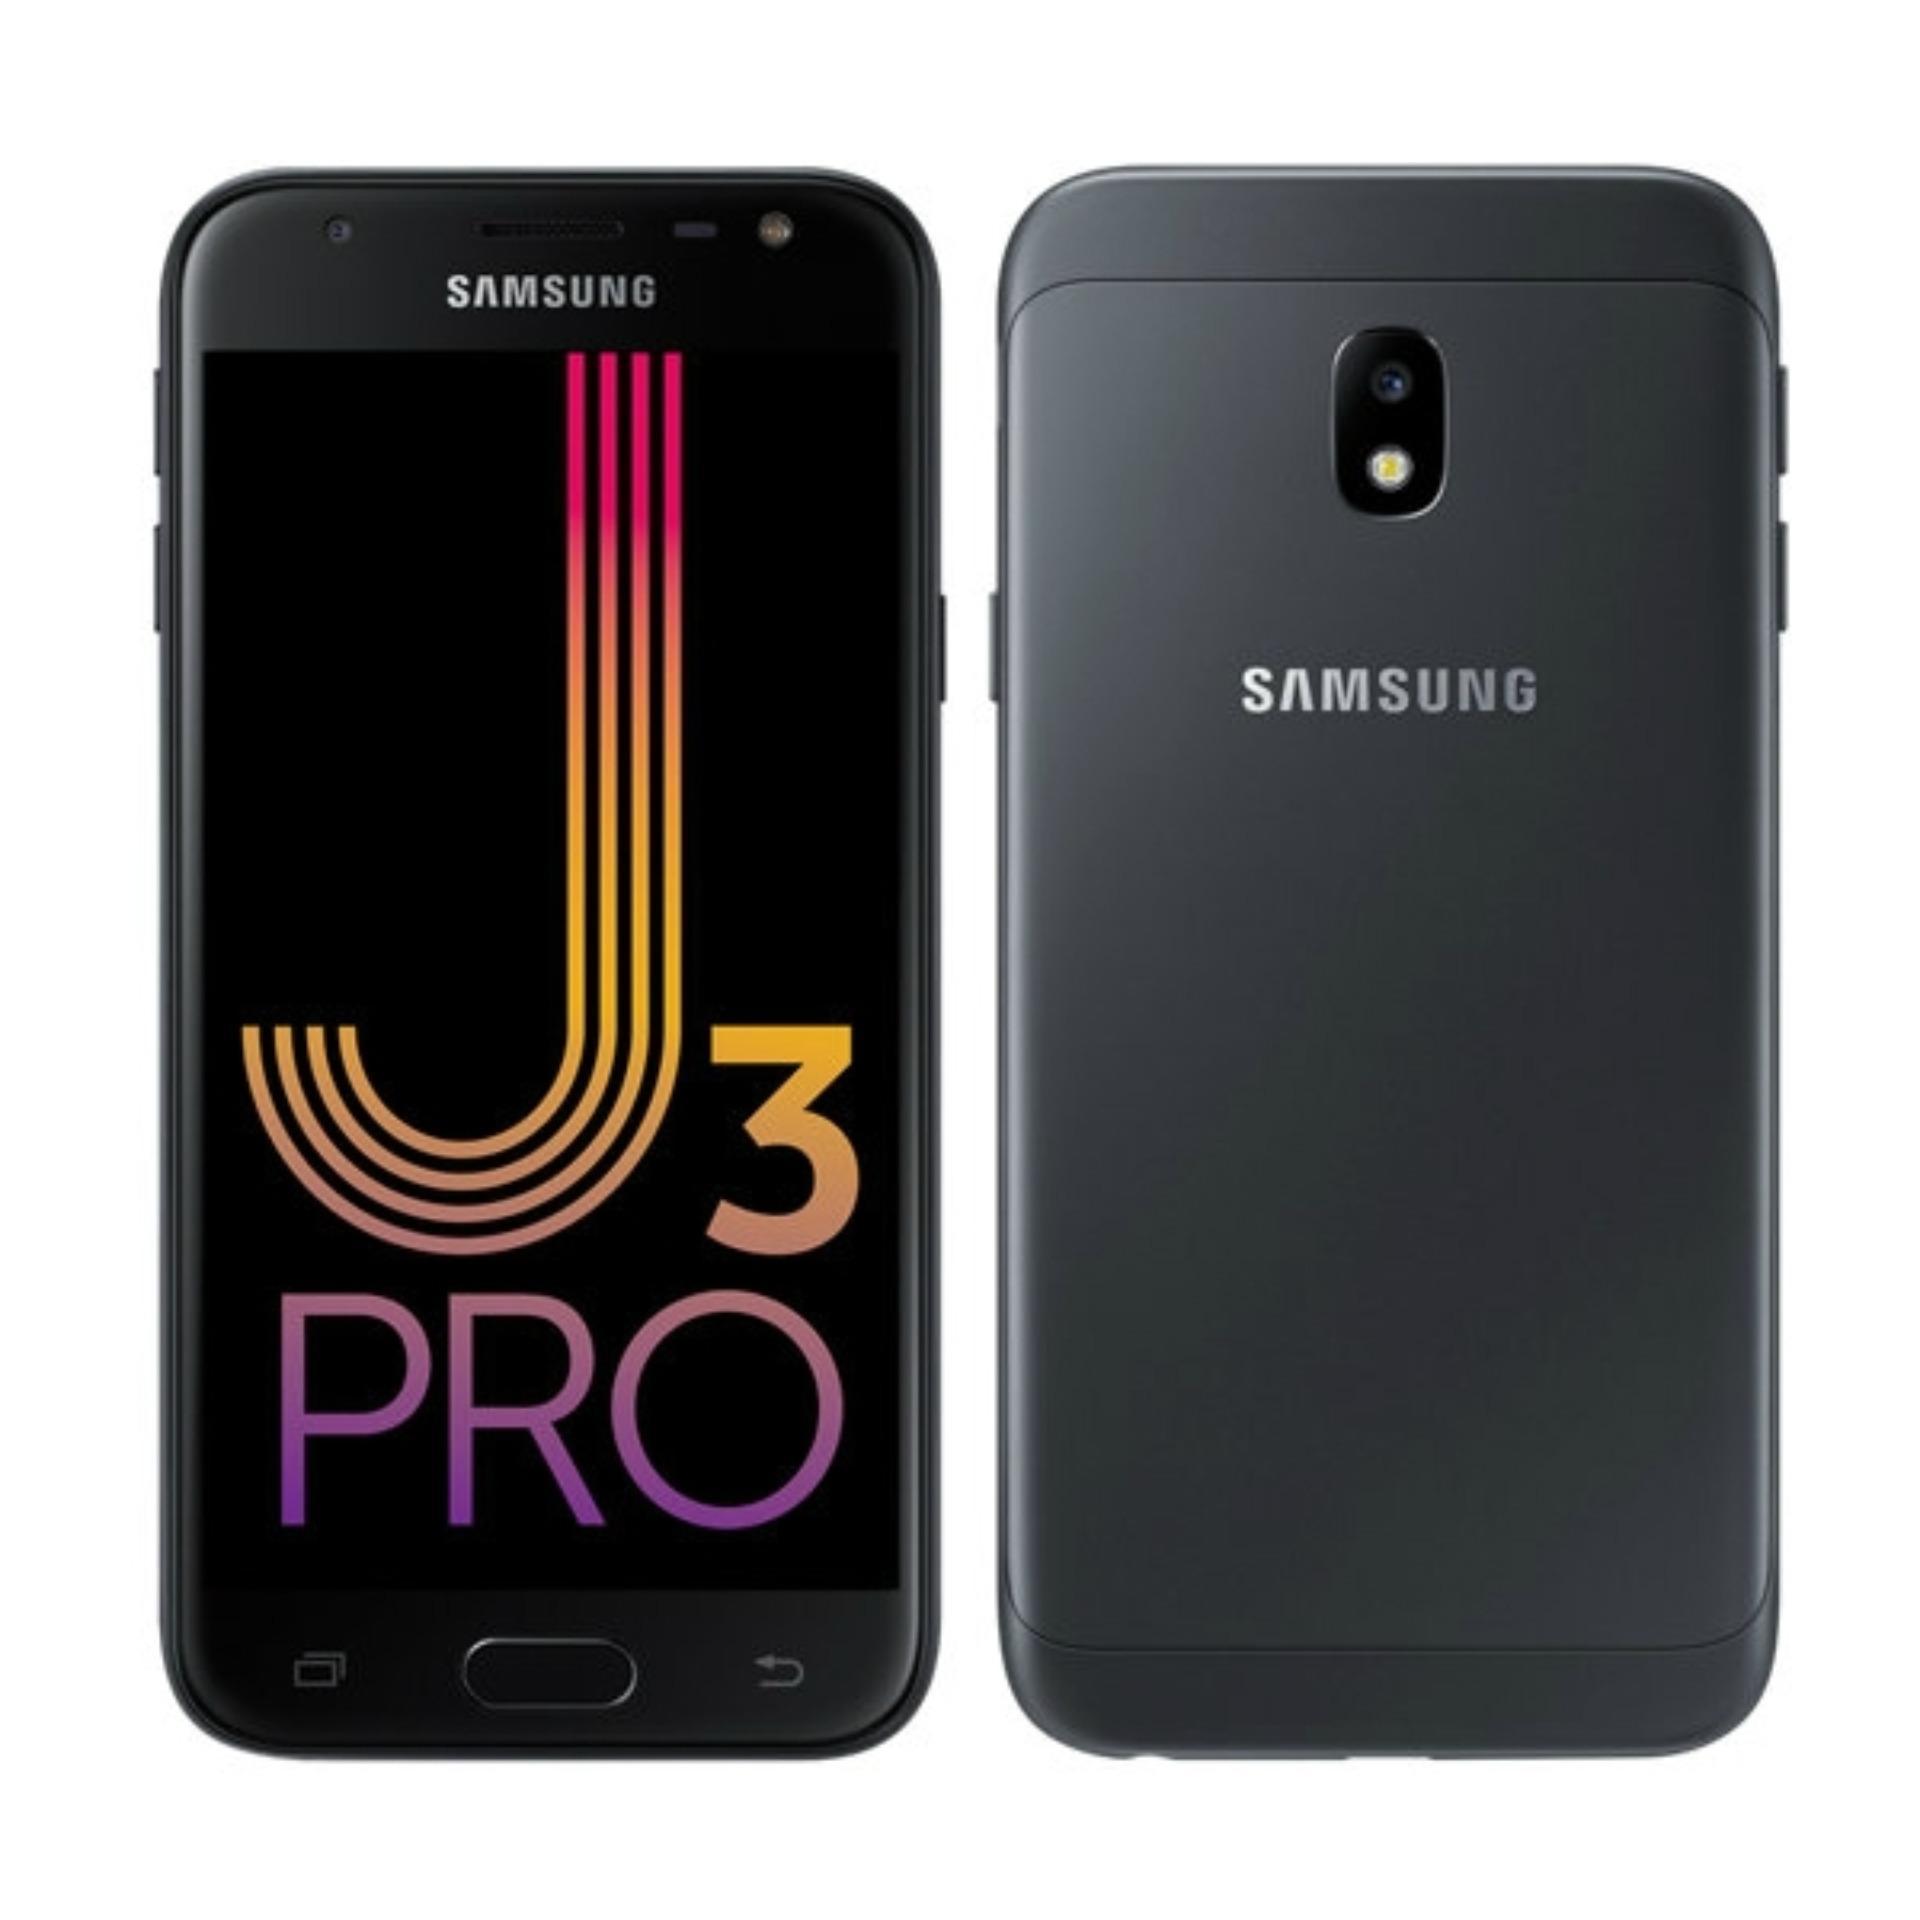 Samsung Galaxy J3 Pro 2017 Smartphone